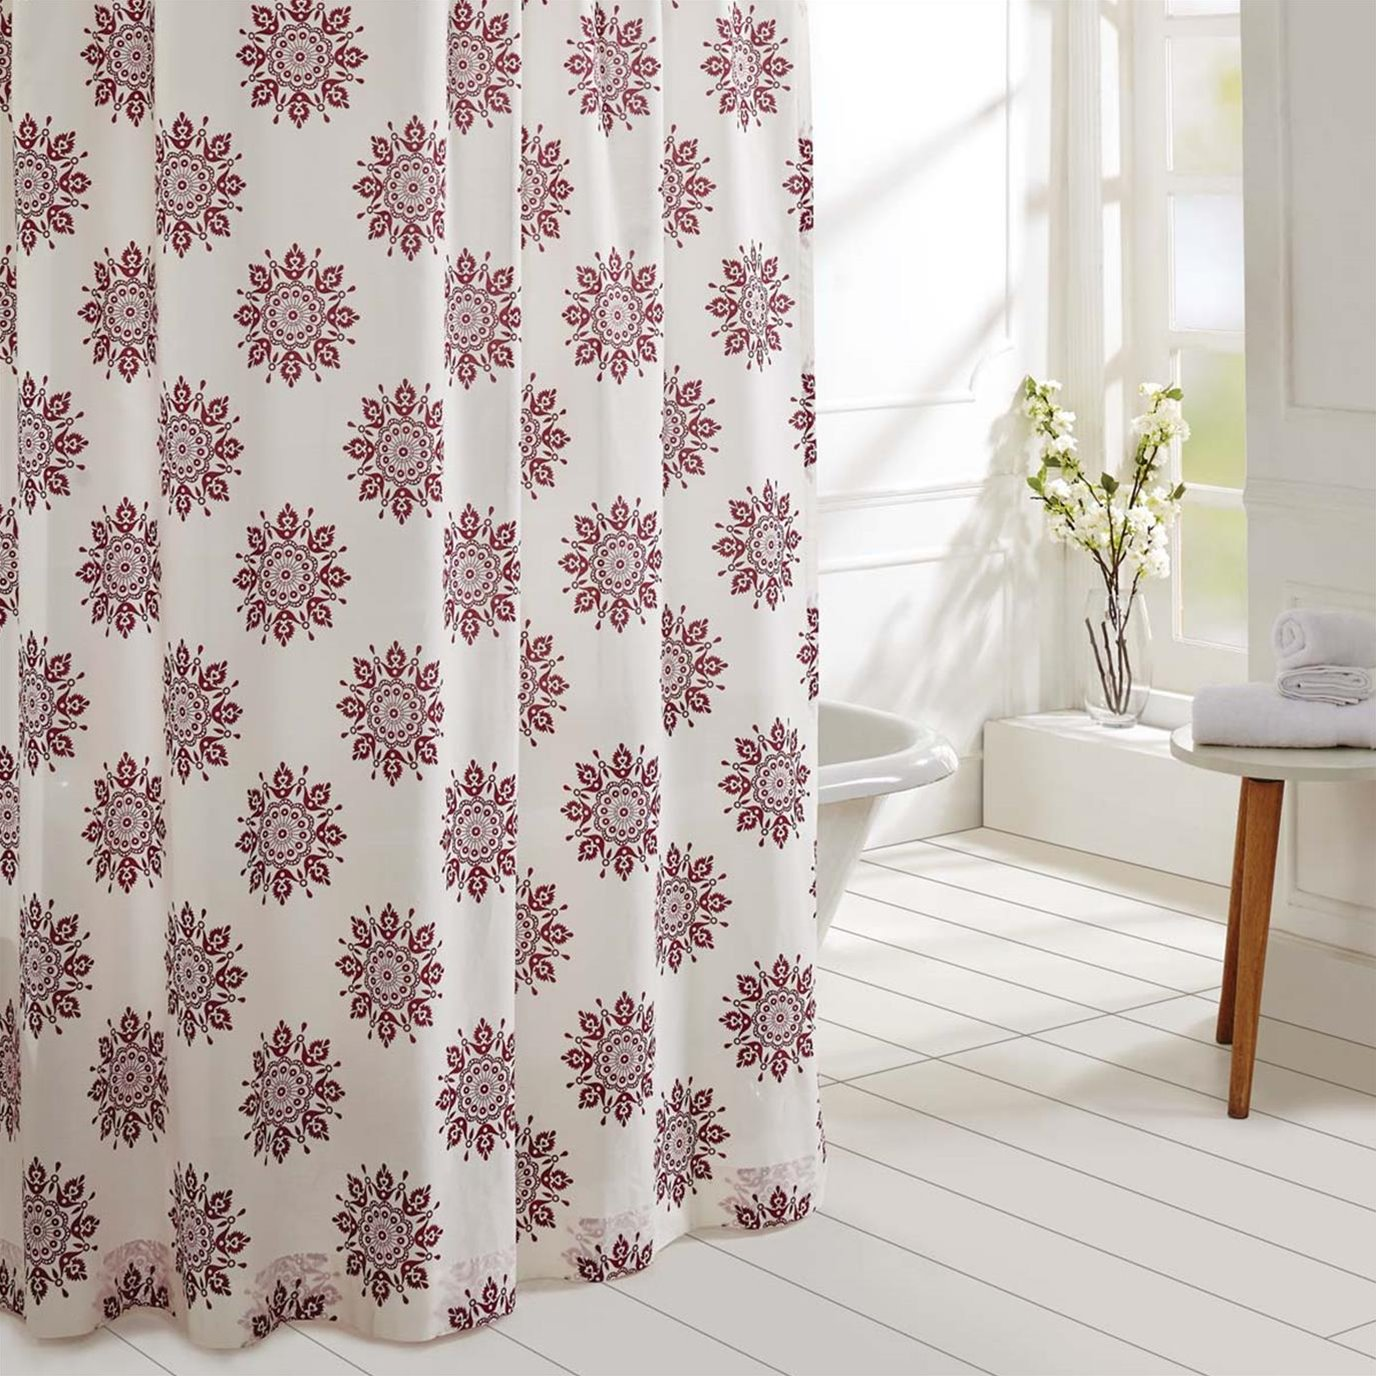 Mariposa Fuchsia Shower Curtain 72x72